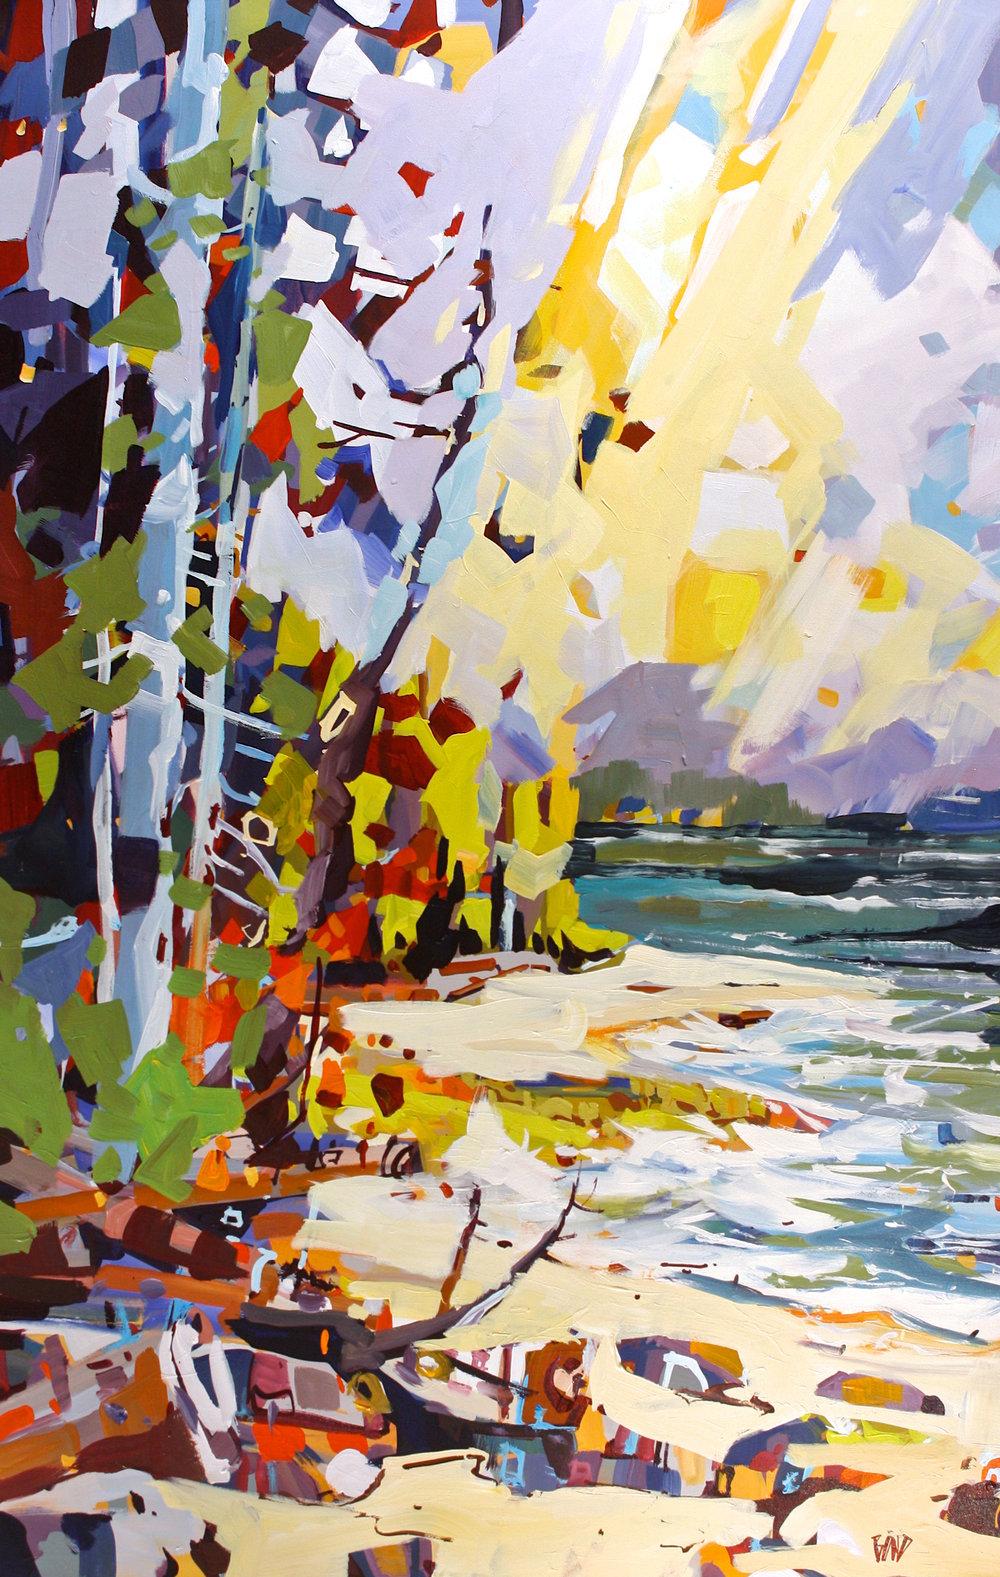 Galiano<Br>60 x 40<Br>Acrylic on Canvas<Br>$ 6400